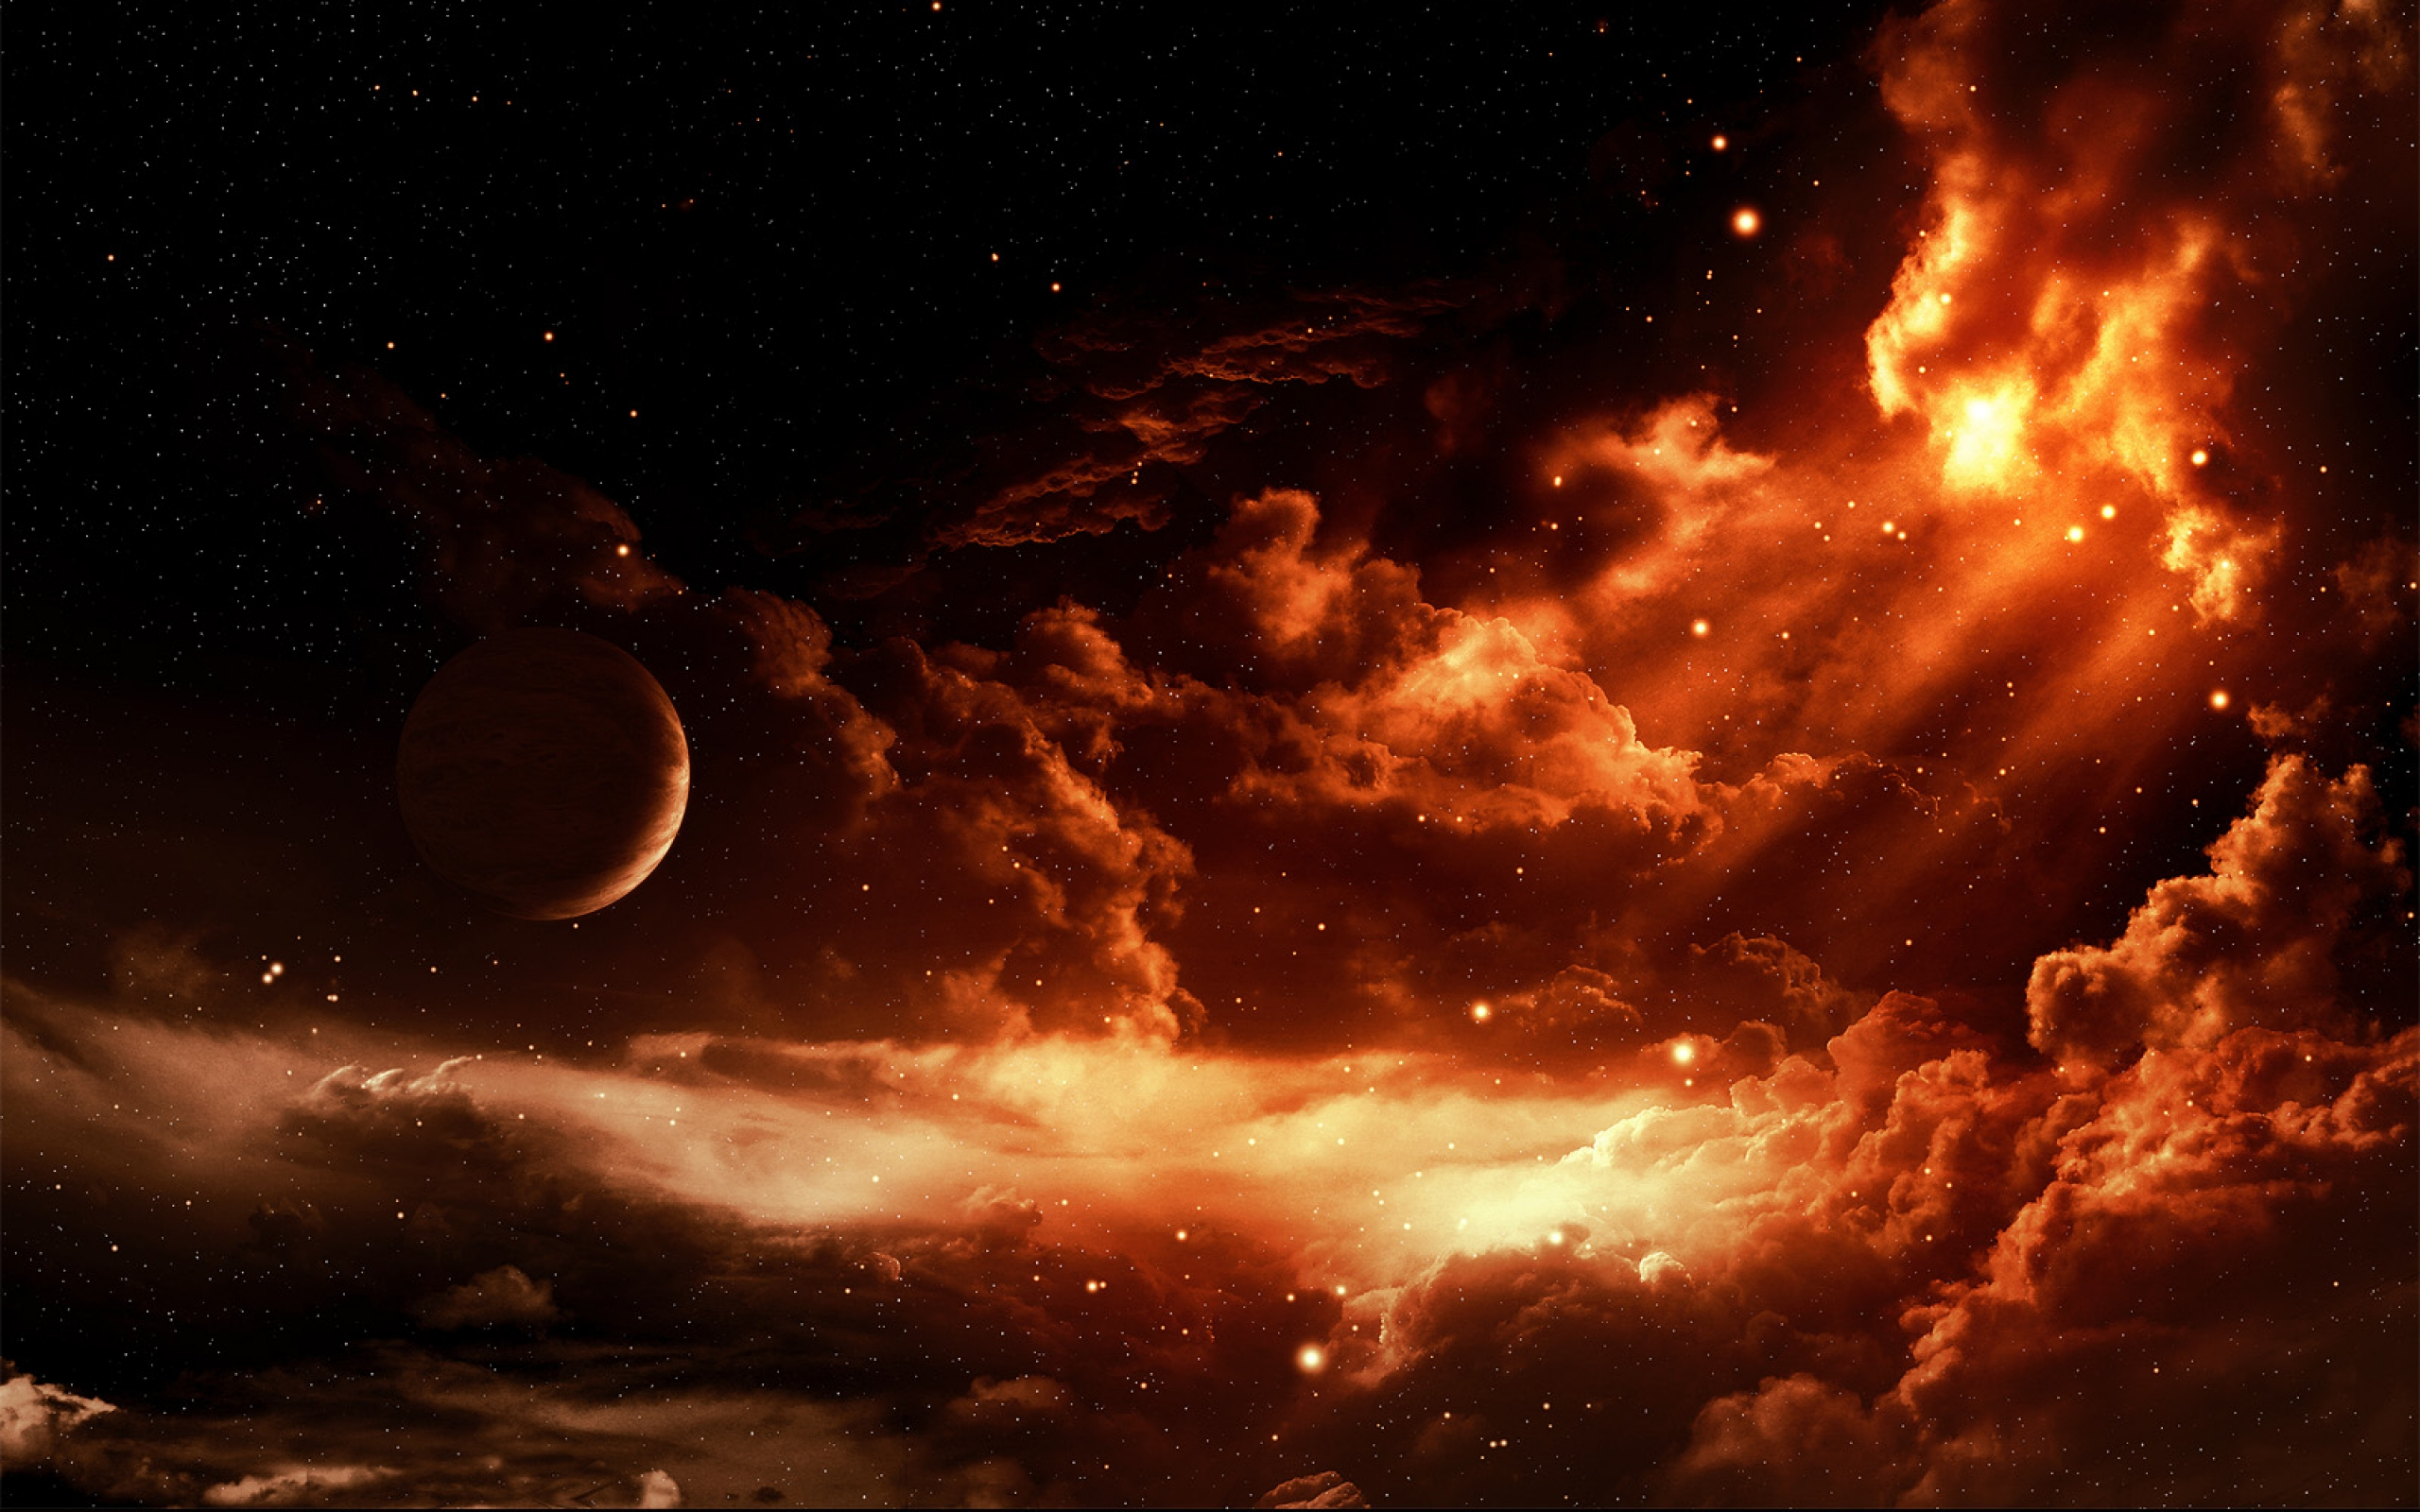 Cloud-Dragon-Wallpaper